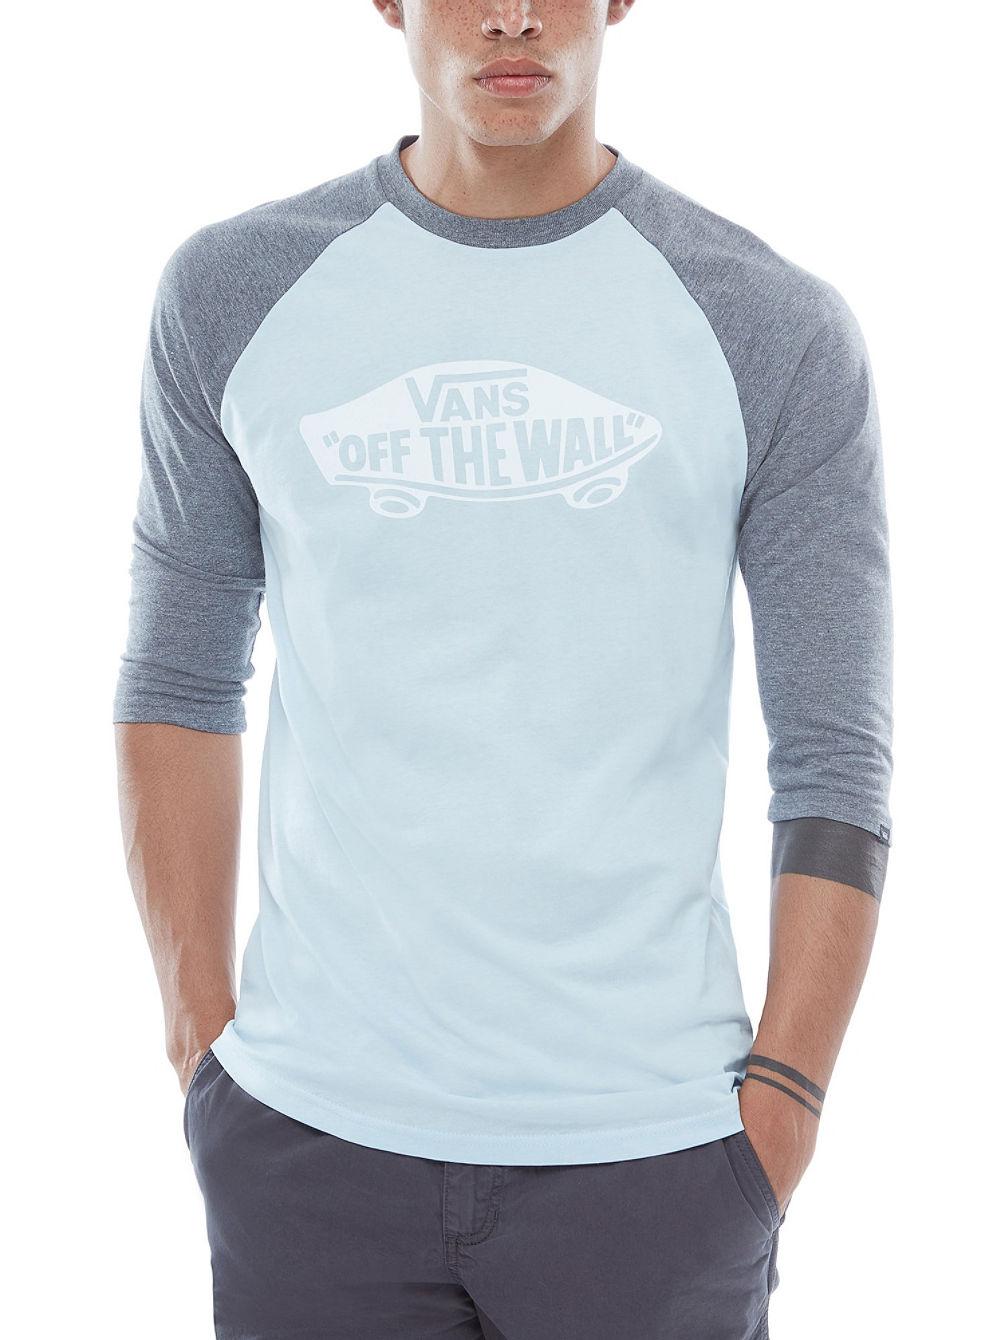 40b9a76b3c Buy Vans Otw Raglan Long Sleeve T-Shirt online at Blue Tomato